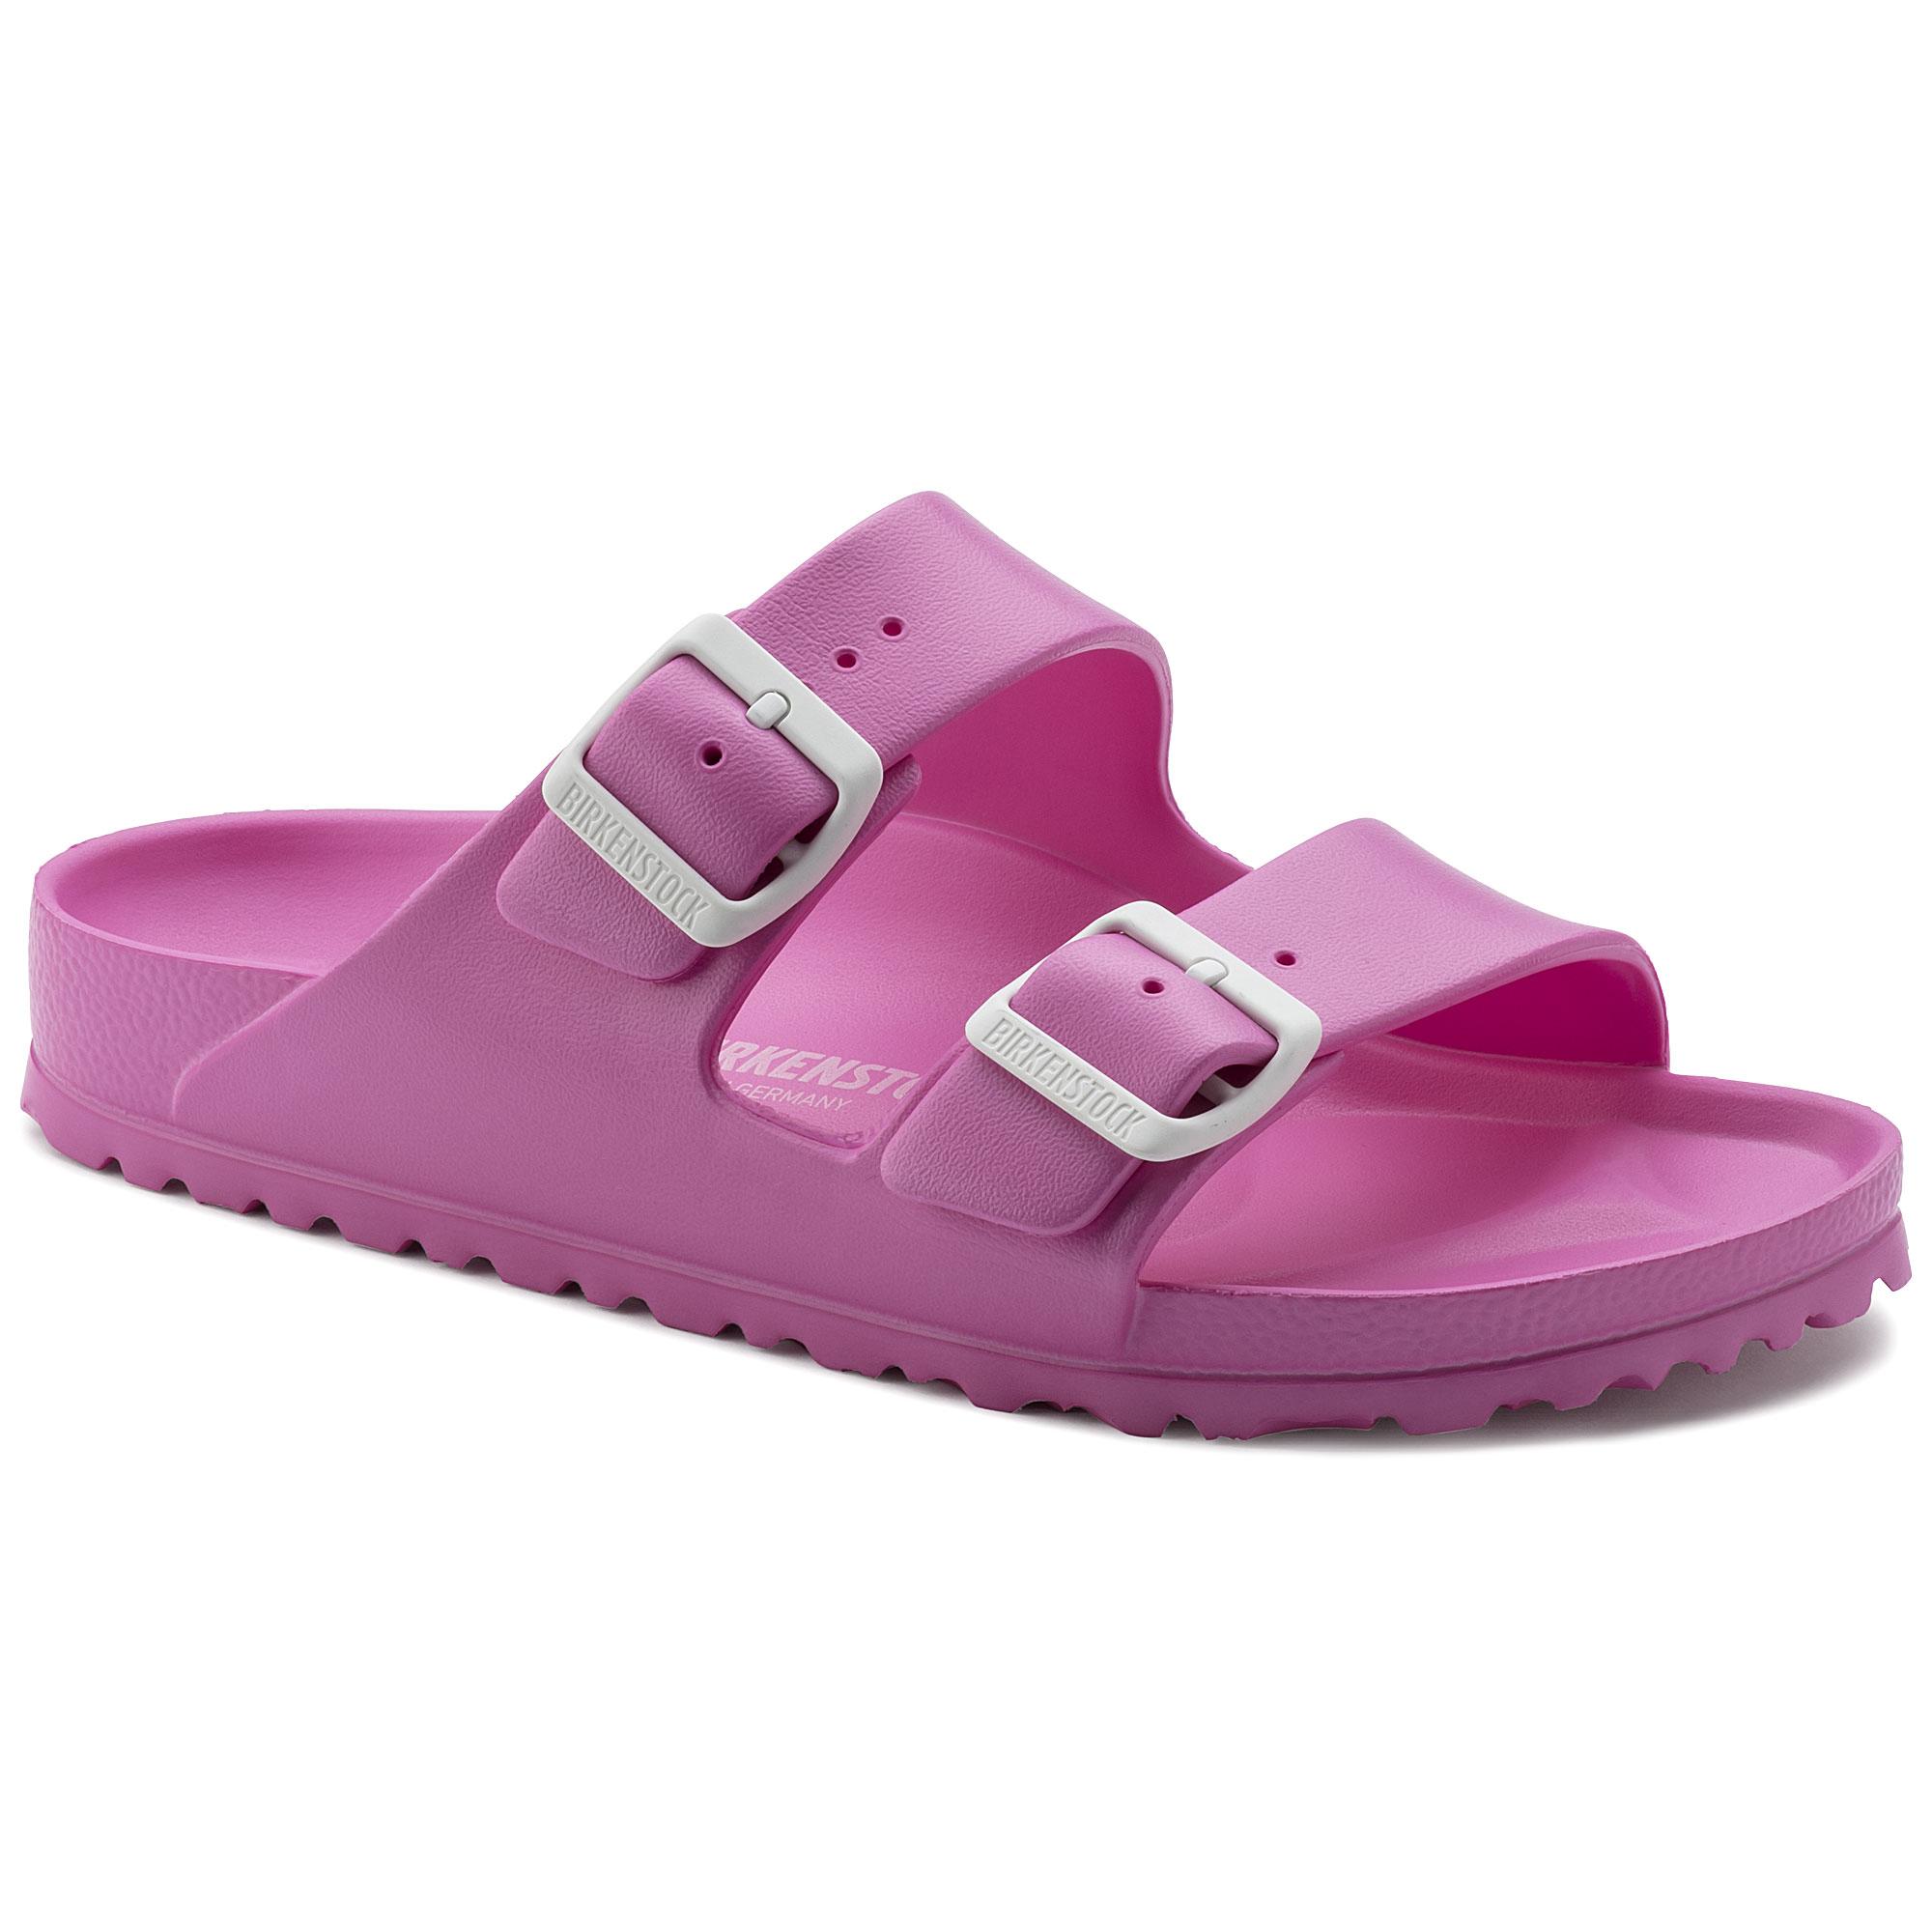 Arizona EVA Neon Pink   shop online at